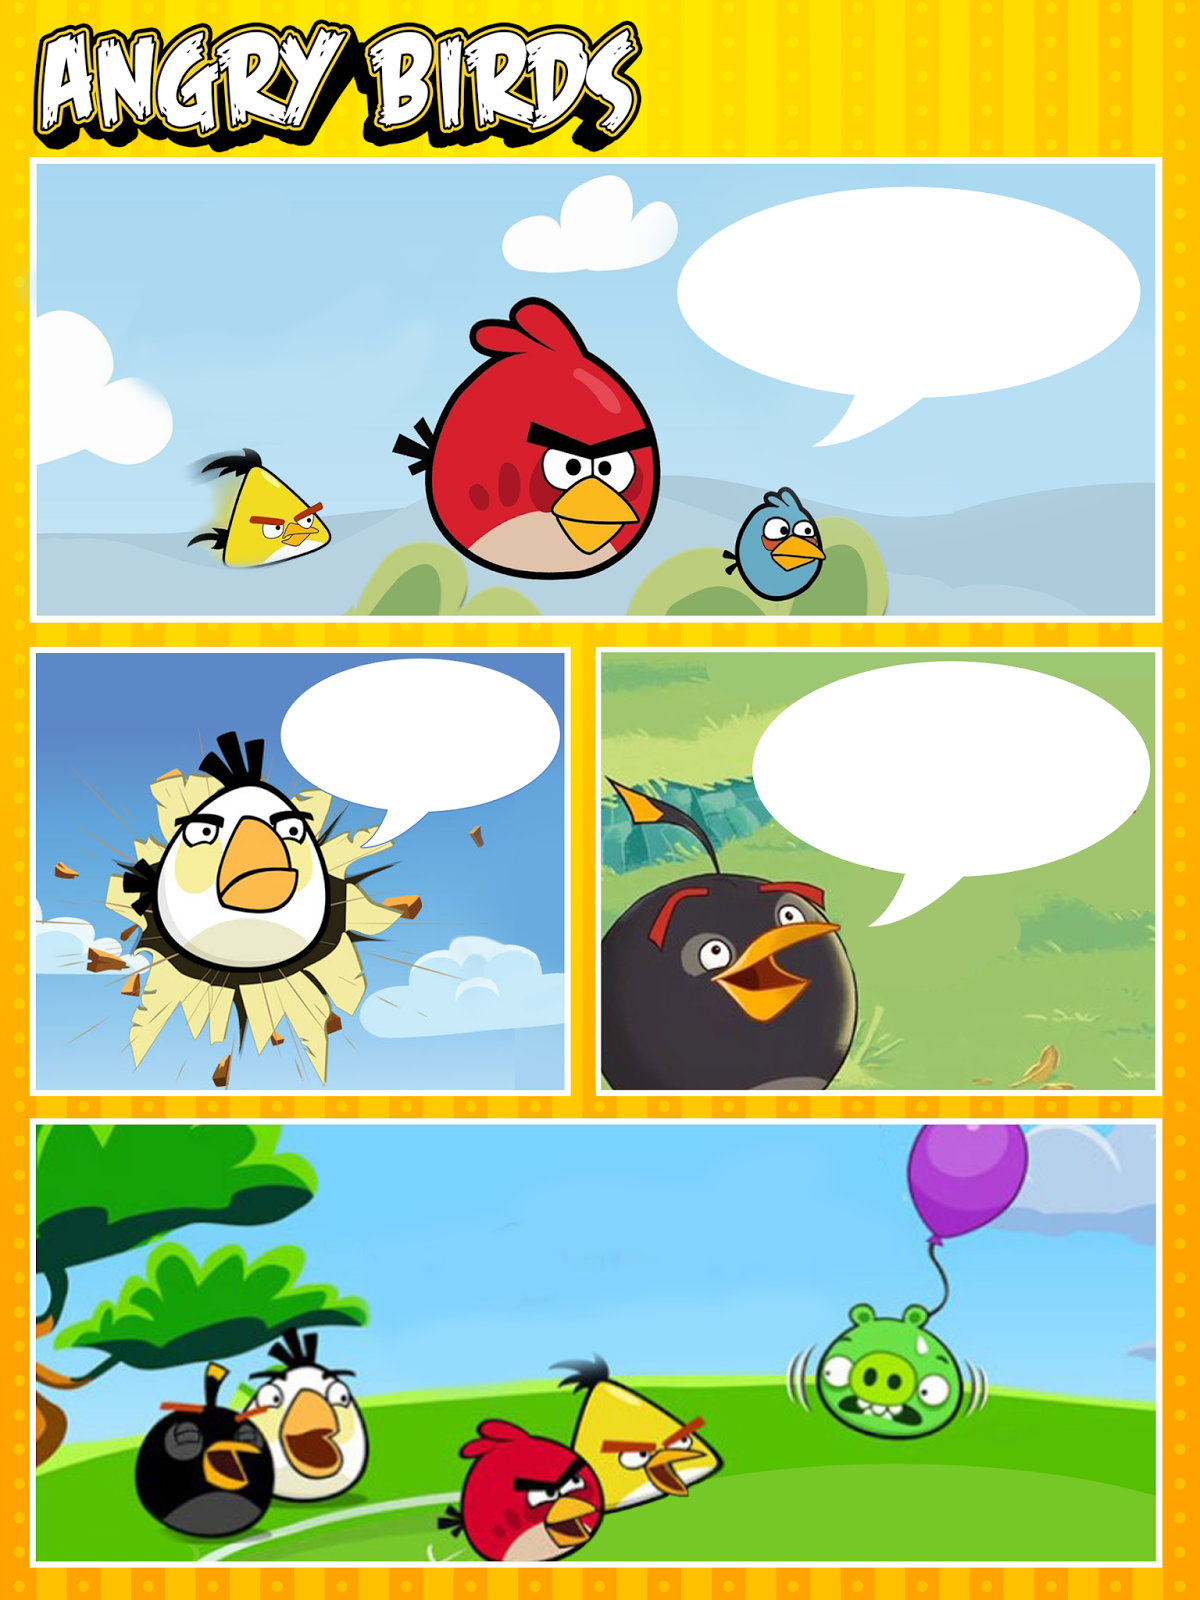 So Original Angry Birds Free Printable Invitations, Frames or ...